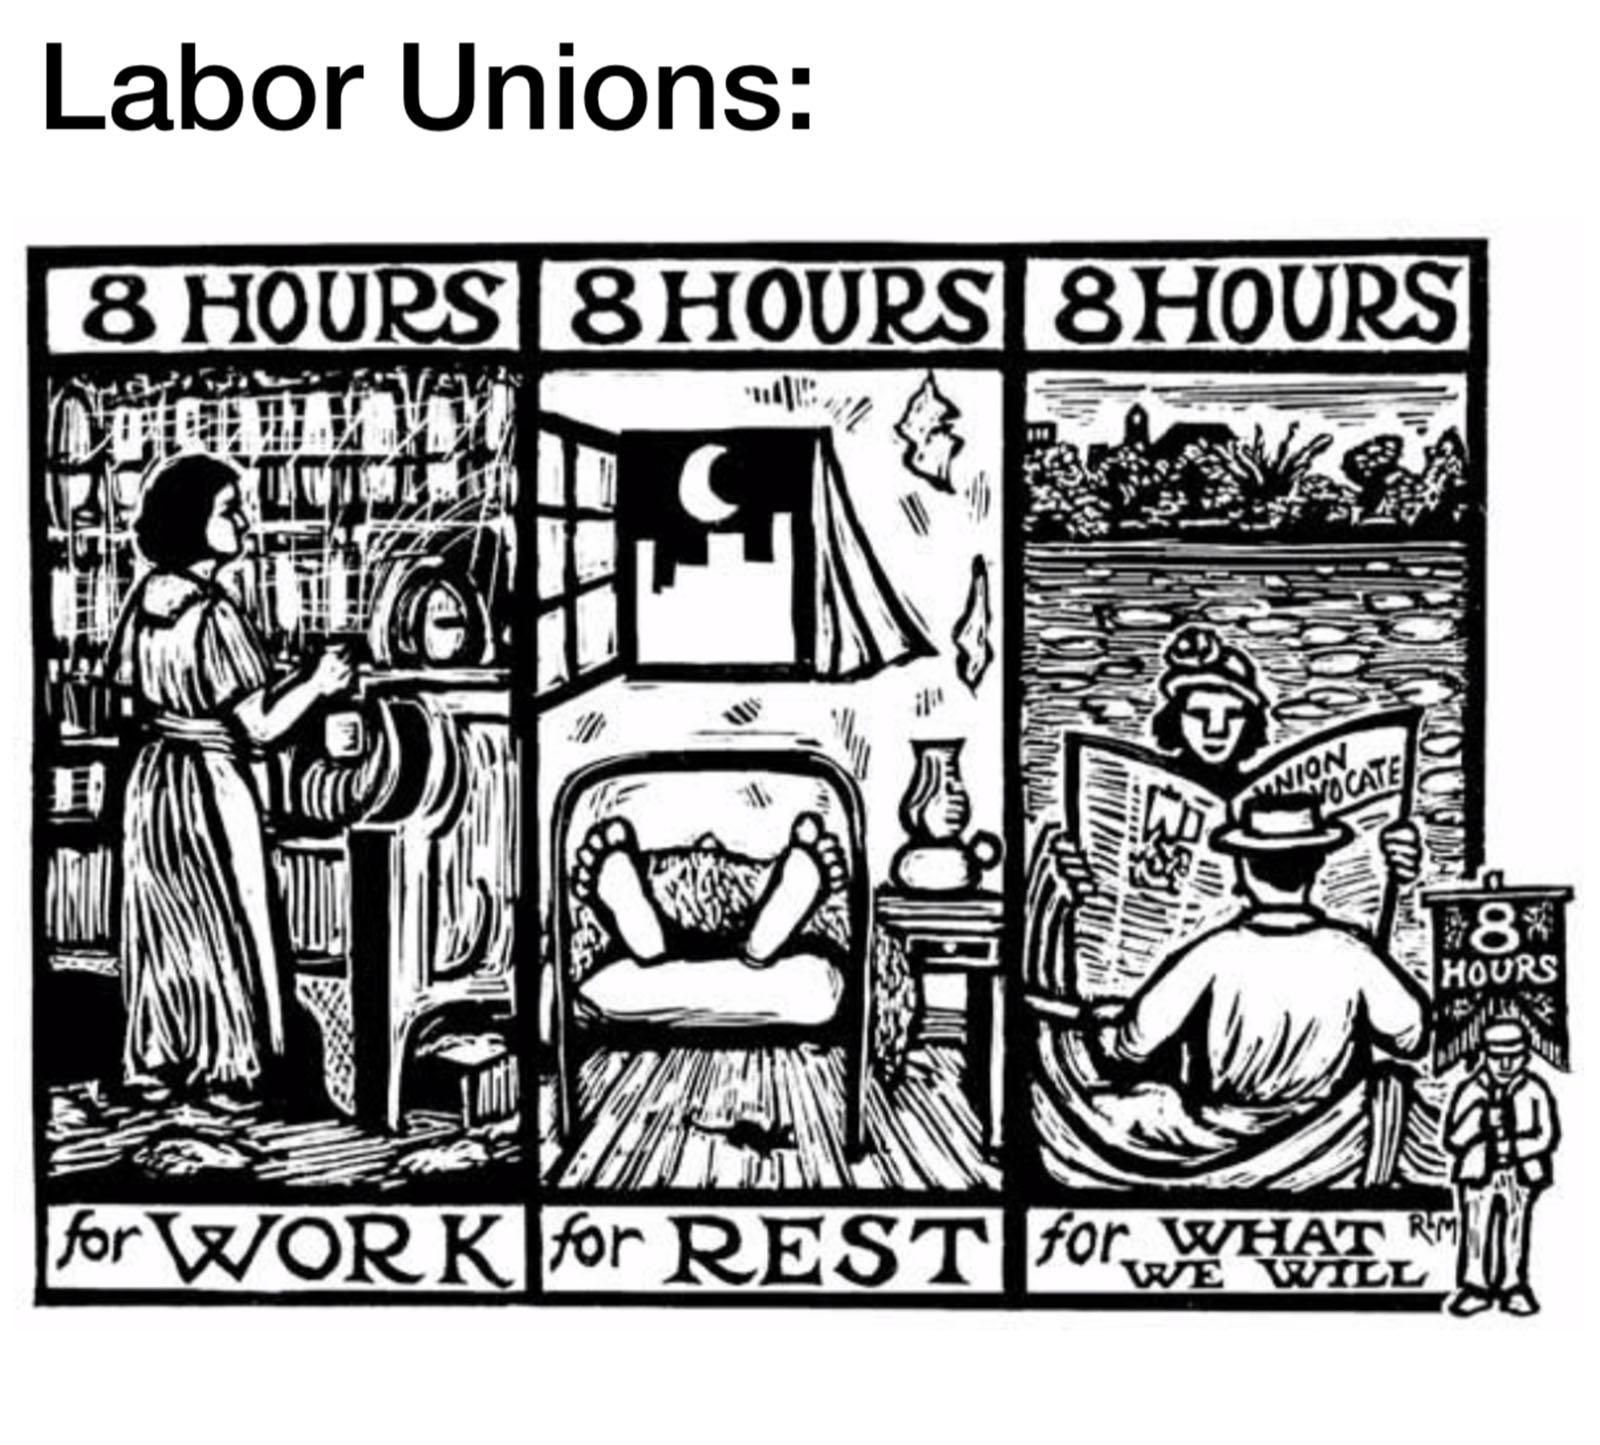 Ape_Bleakney_Print_For_The_People_Unions.jpg